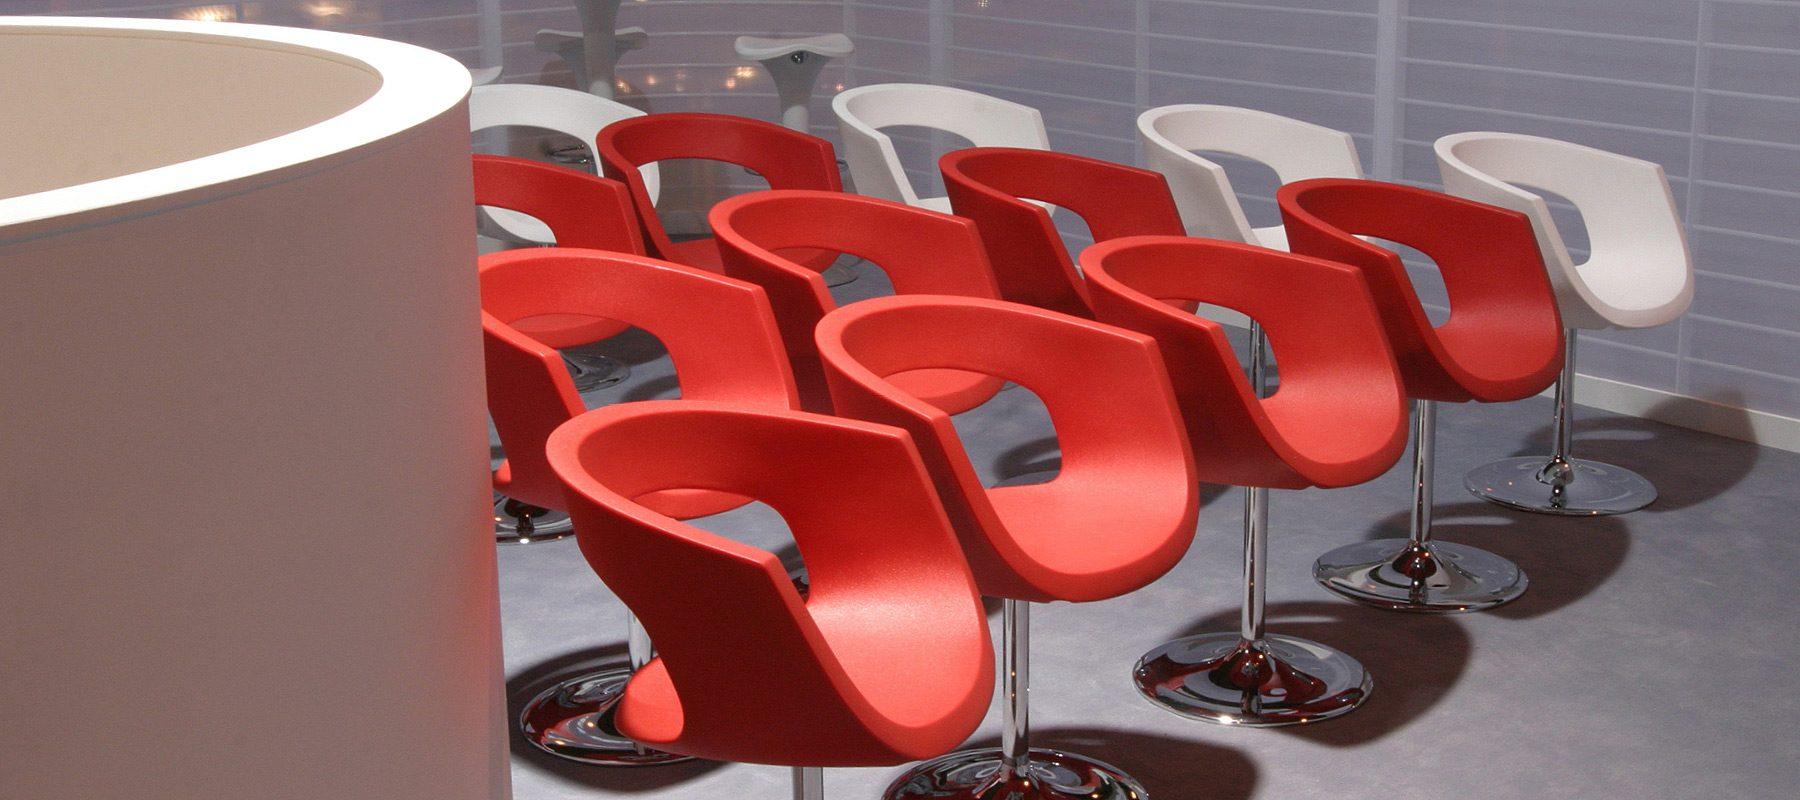 bt redcare exhibition chairs interior design